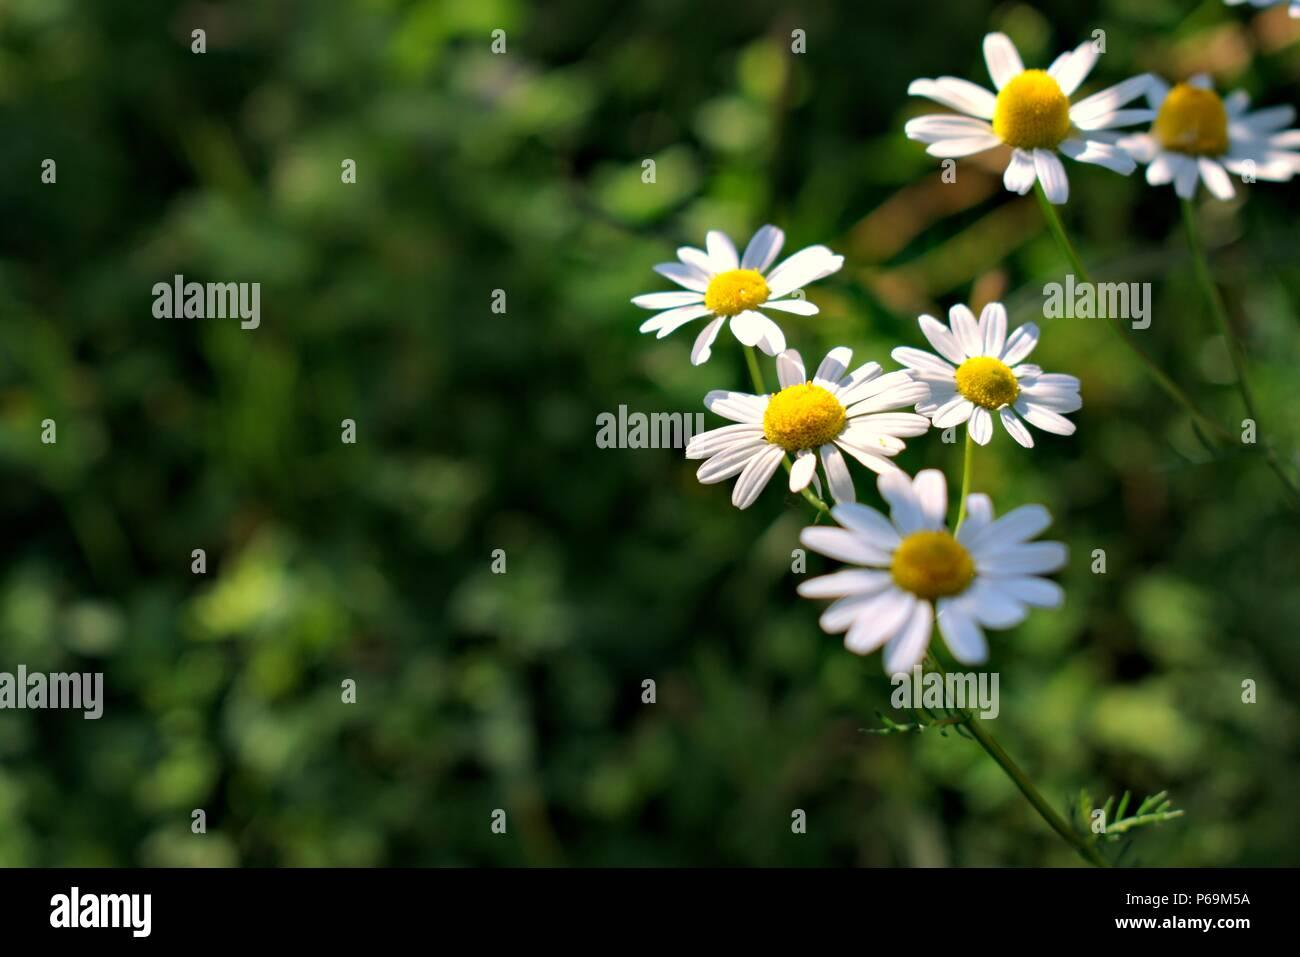 Natureflowersenvironmentparks And Summery Concept White Wild